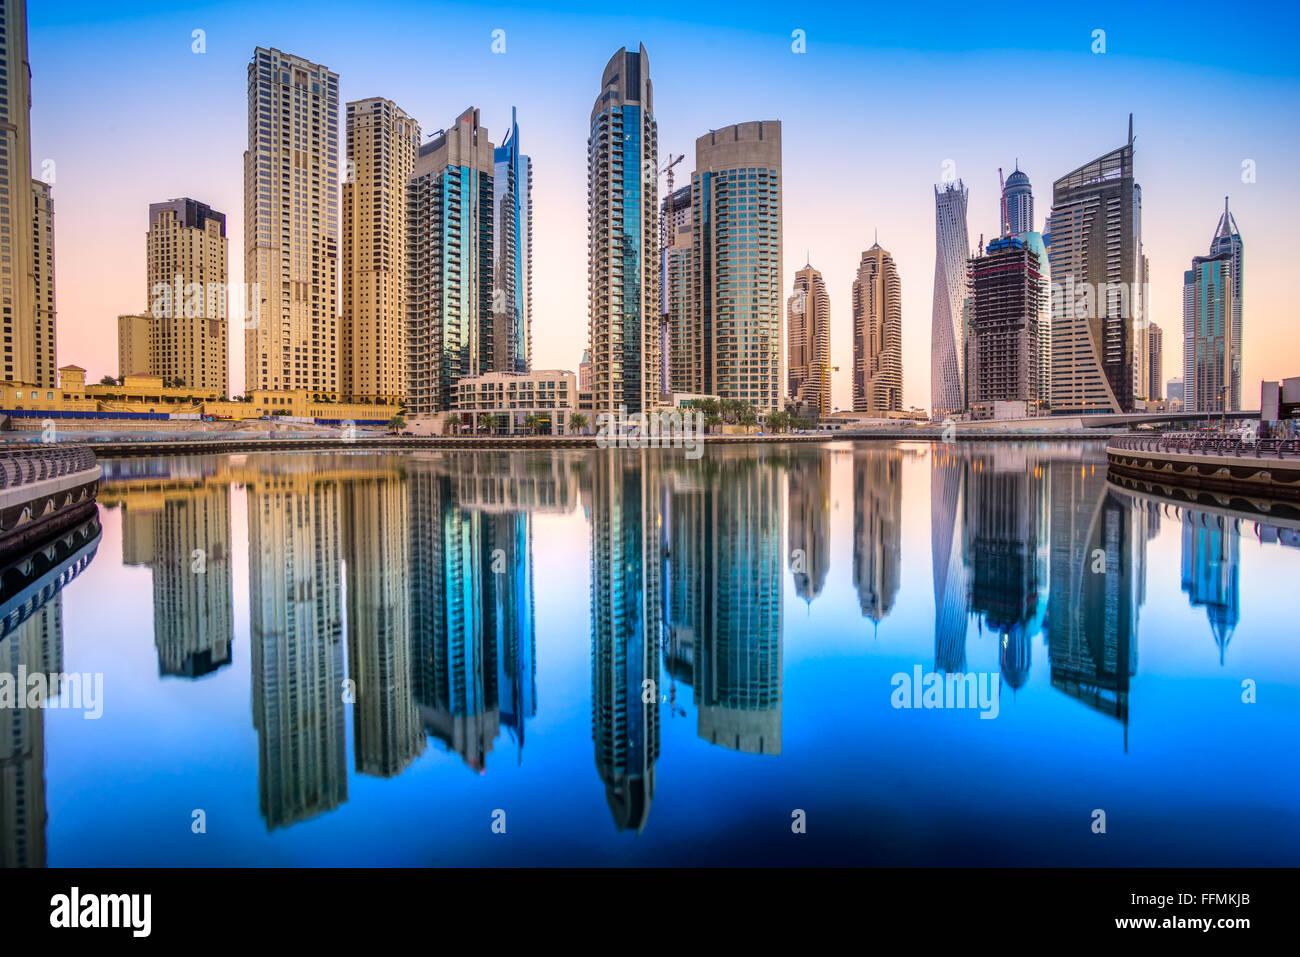 Skyscrapers in Dubai Marina. UAE - Stock Image